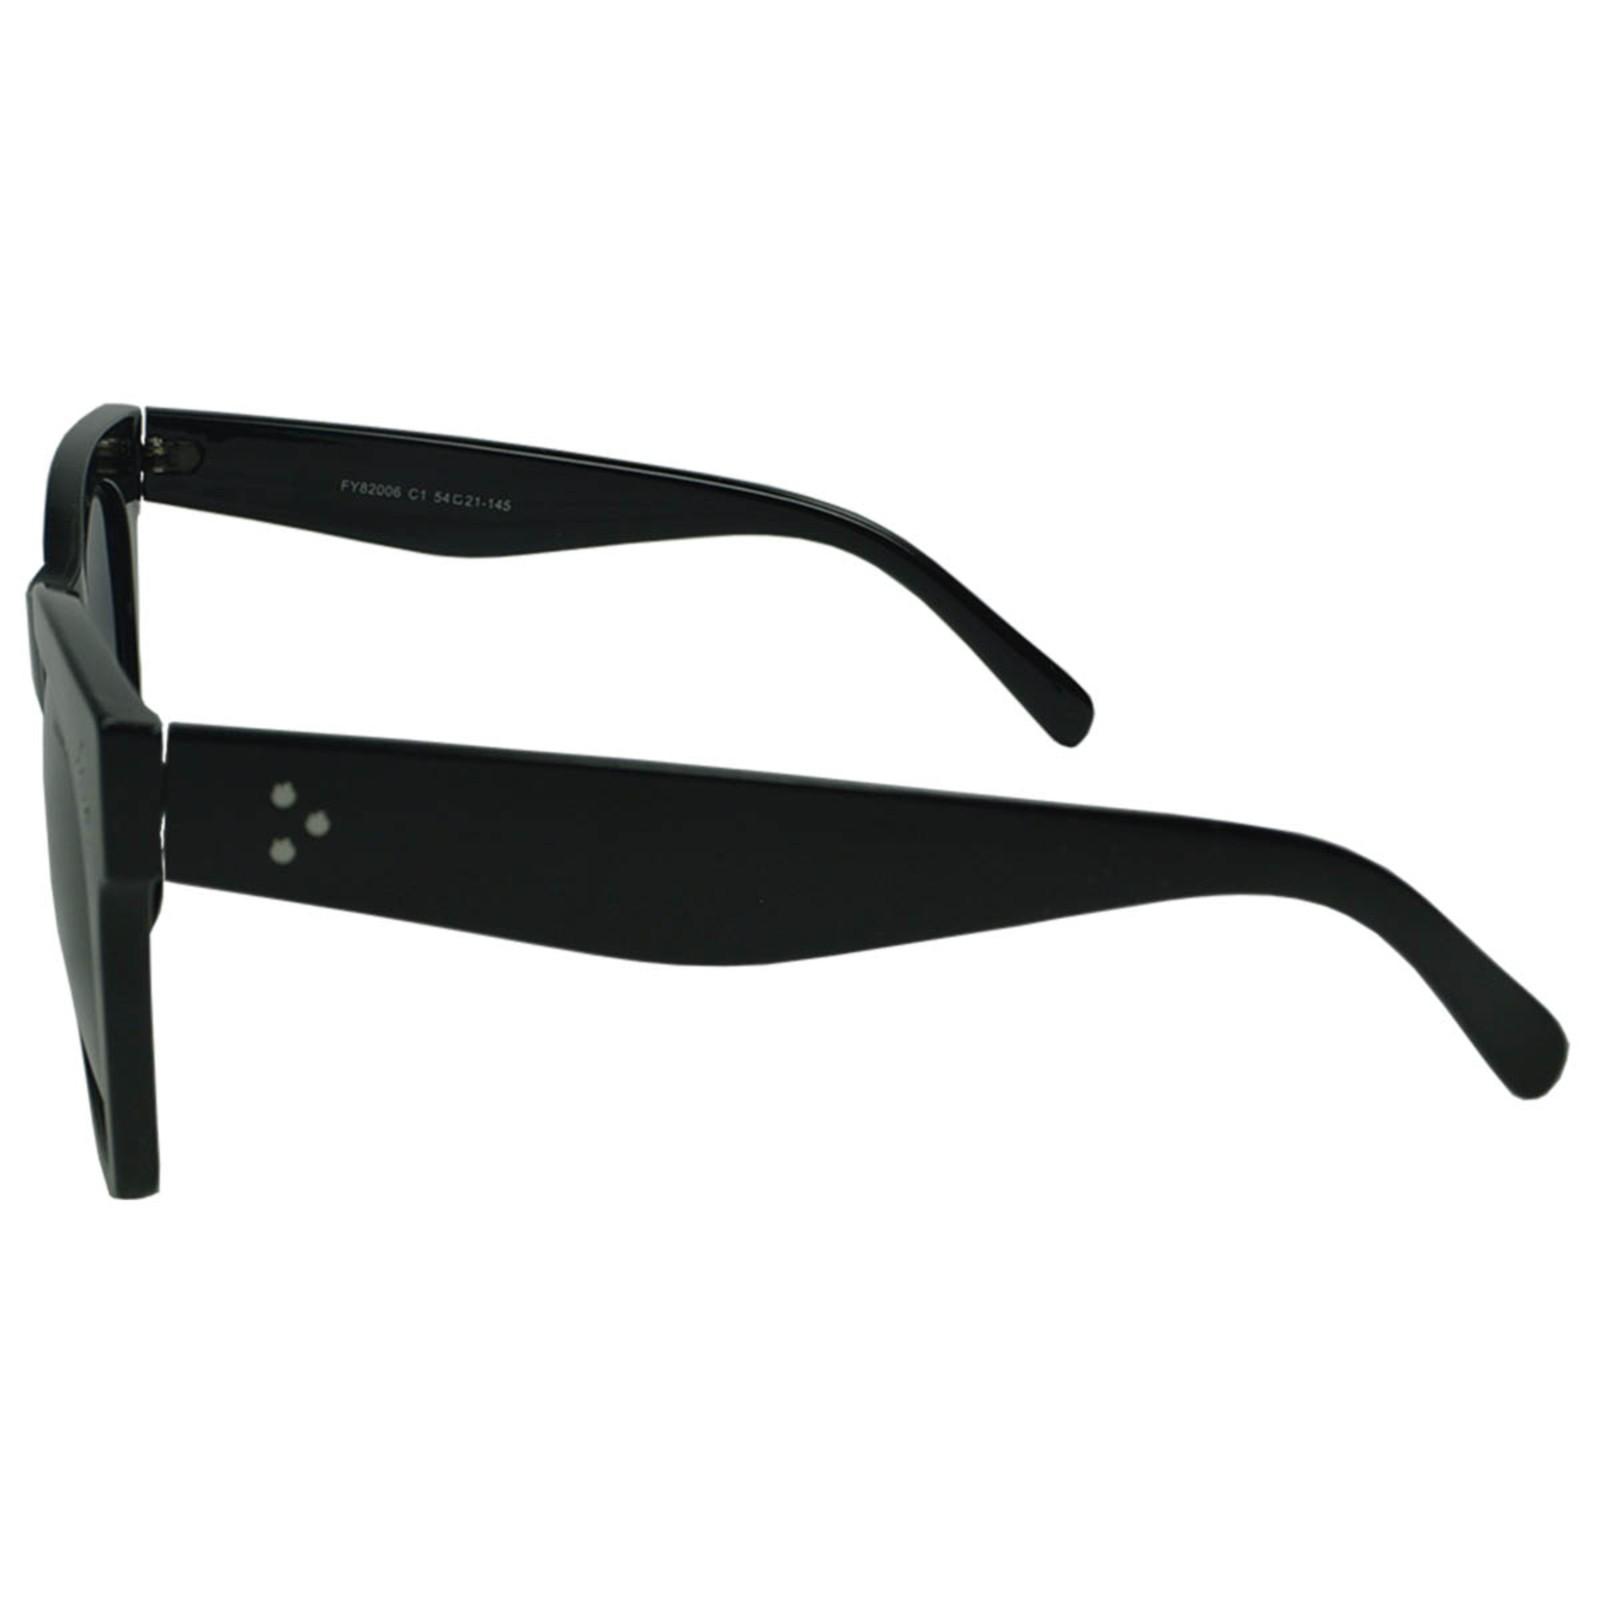 Óculos De Sol Mackage Feminino Acetato Oversize Quadrado Retrô - Preto